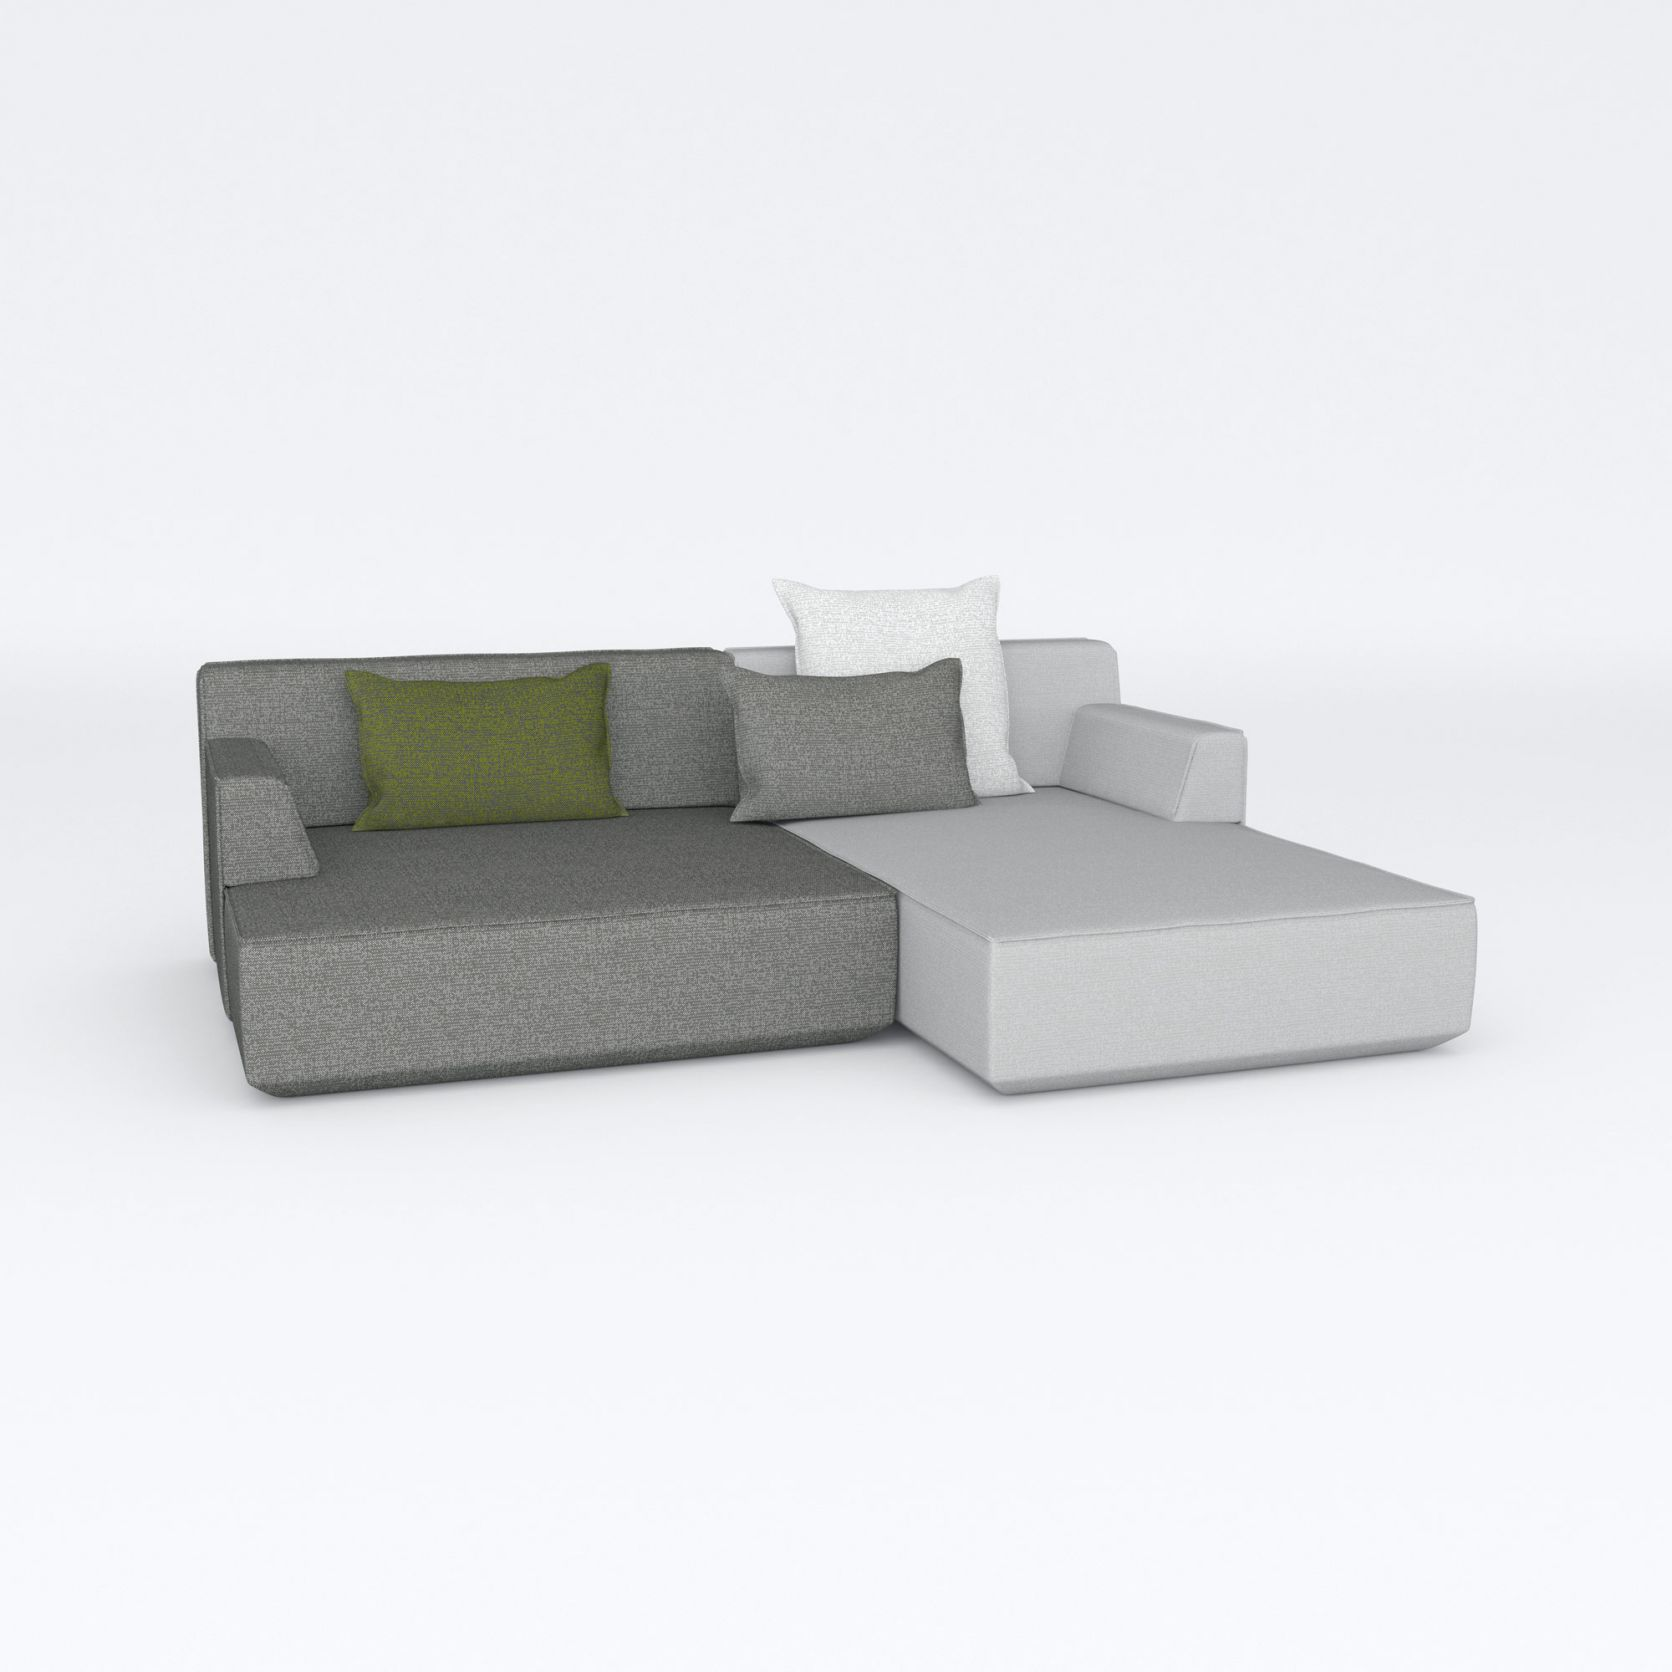 Cooles Sofa Von Tom Tailor Coole Sofas Sofa Wohnen